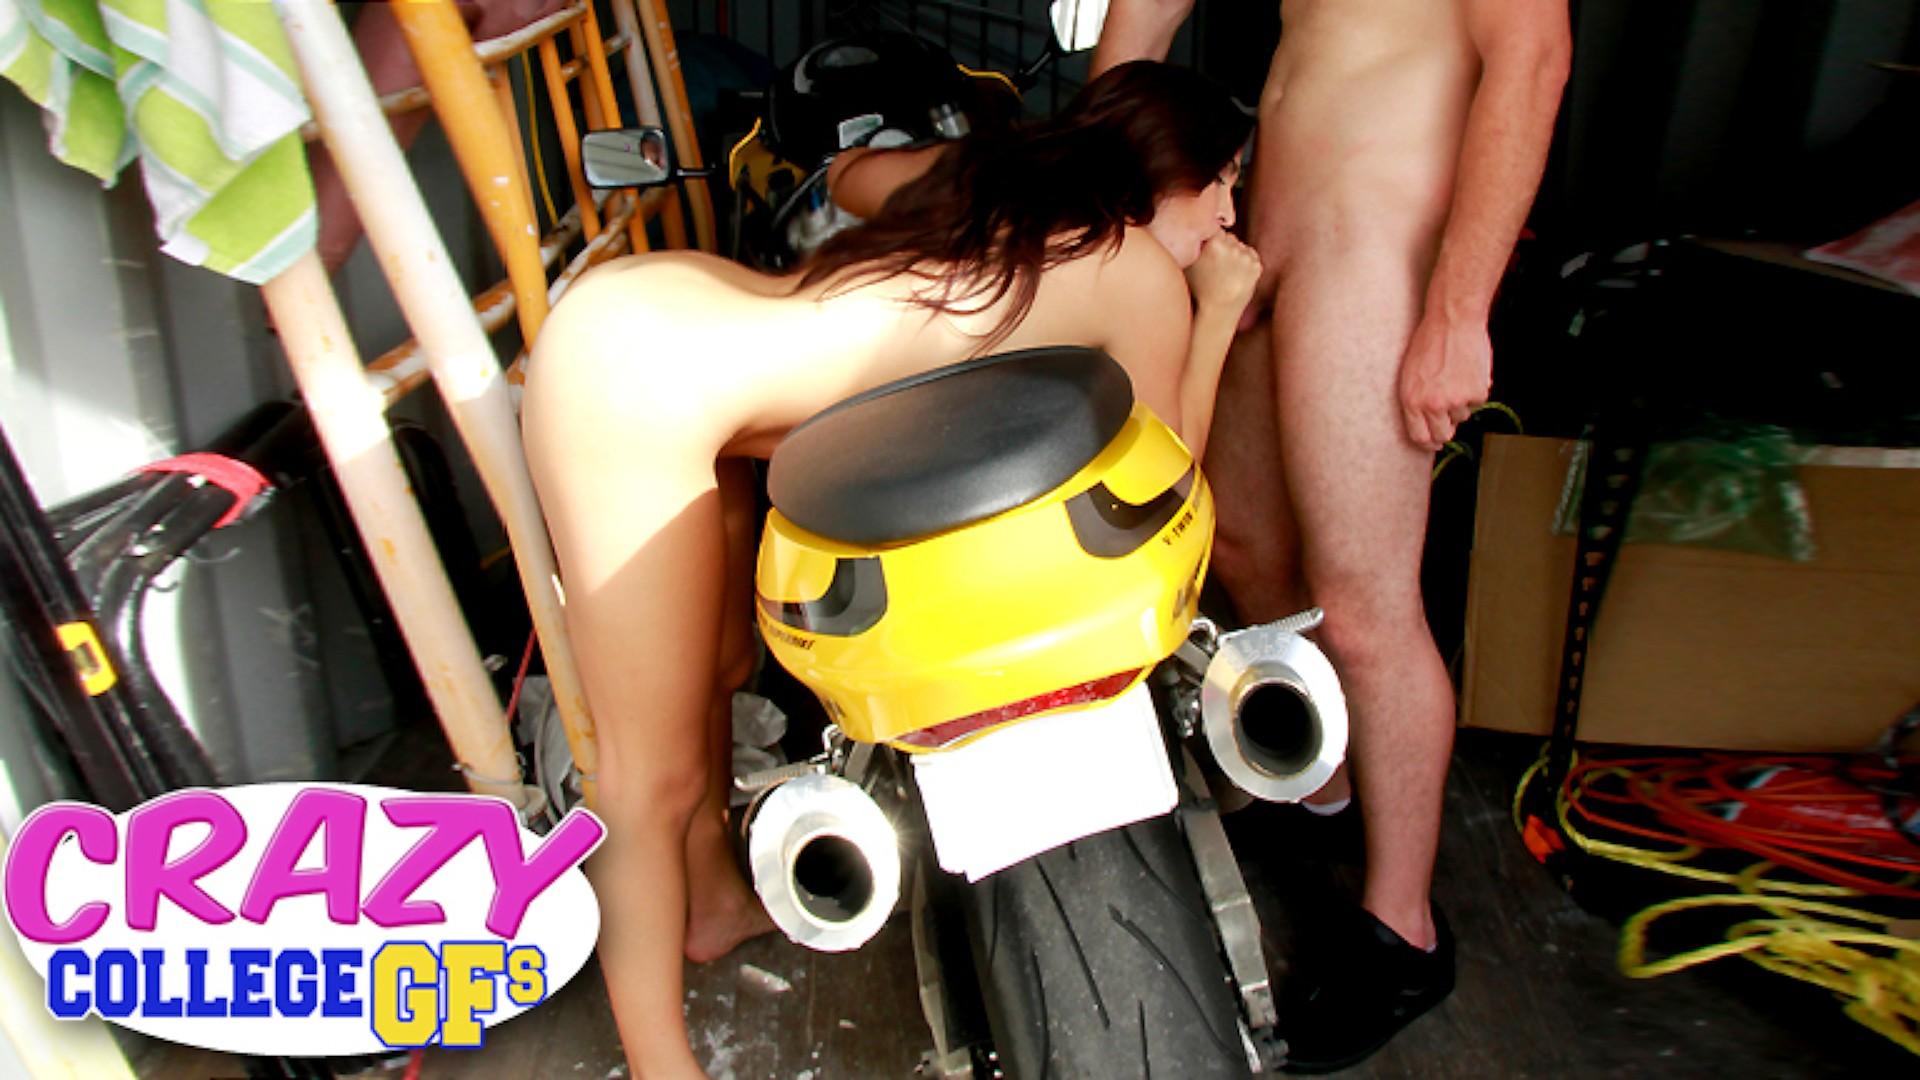 Naked Rider - Crazy College GFs